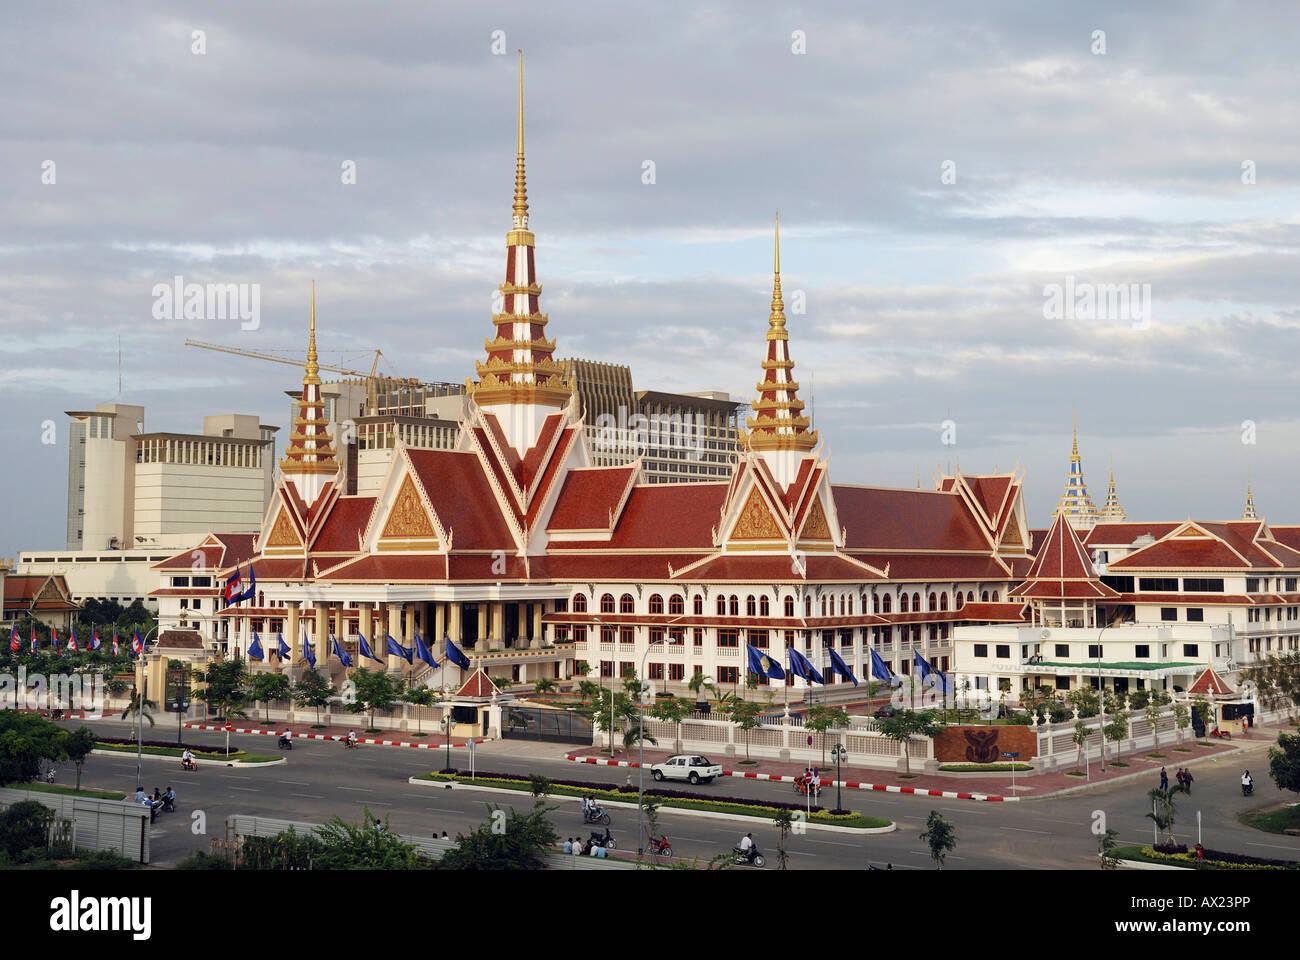 National Assembly and Nagar Casino (Background), Phnom Penh, Cambodia - Stock Image